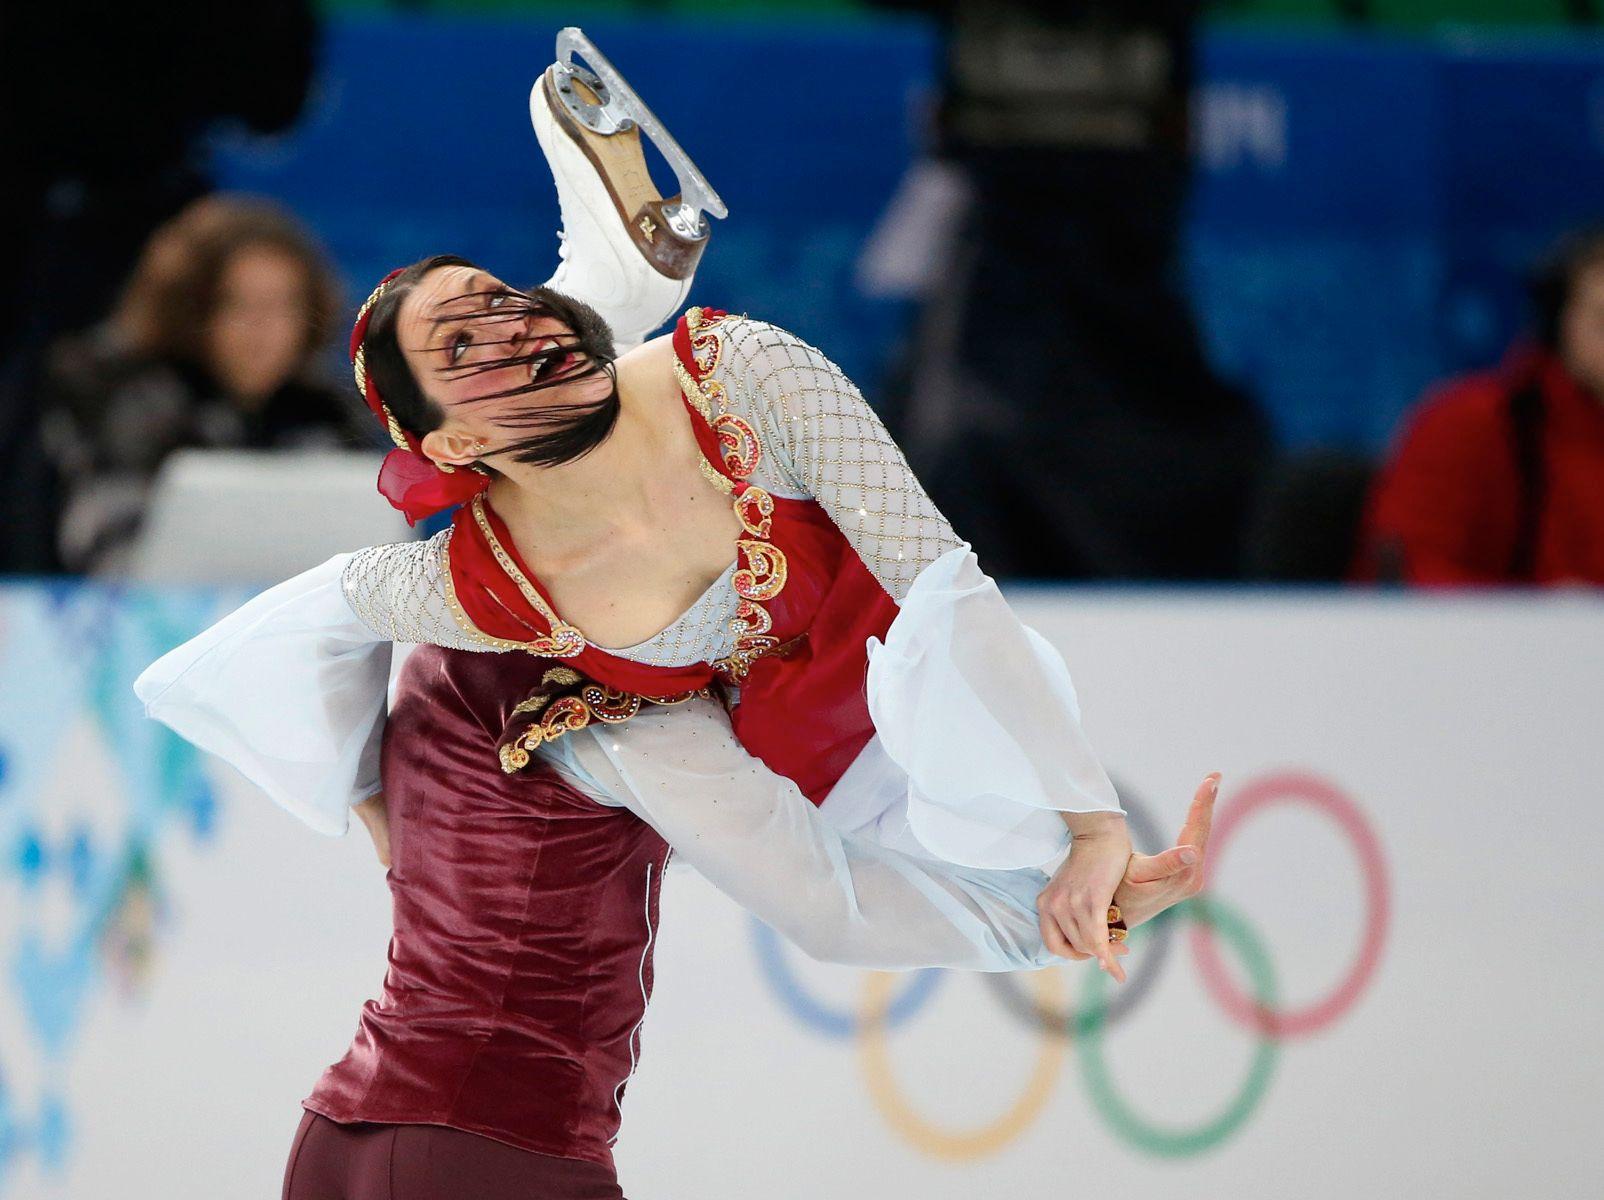 FEBRUARY 17, 2014  SOCHI, RUSSIA